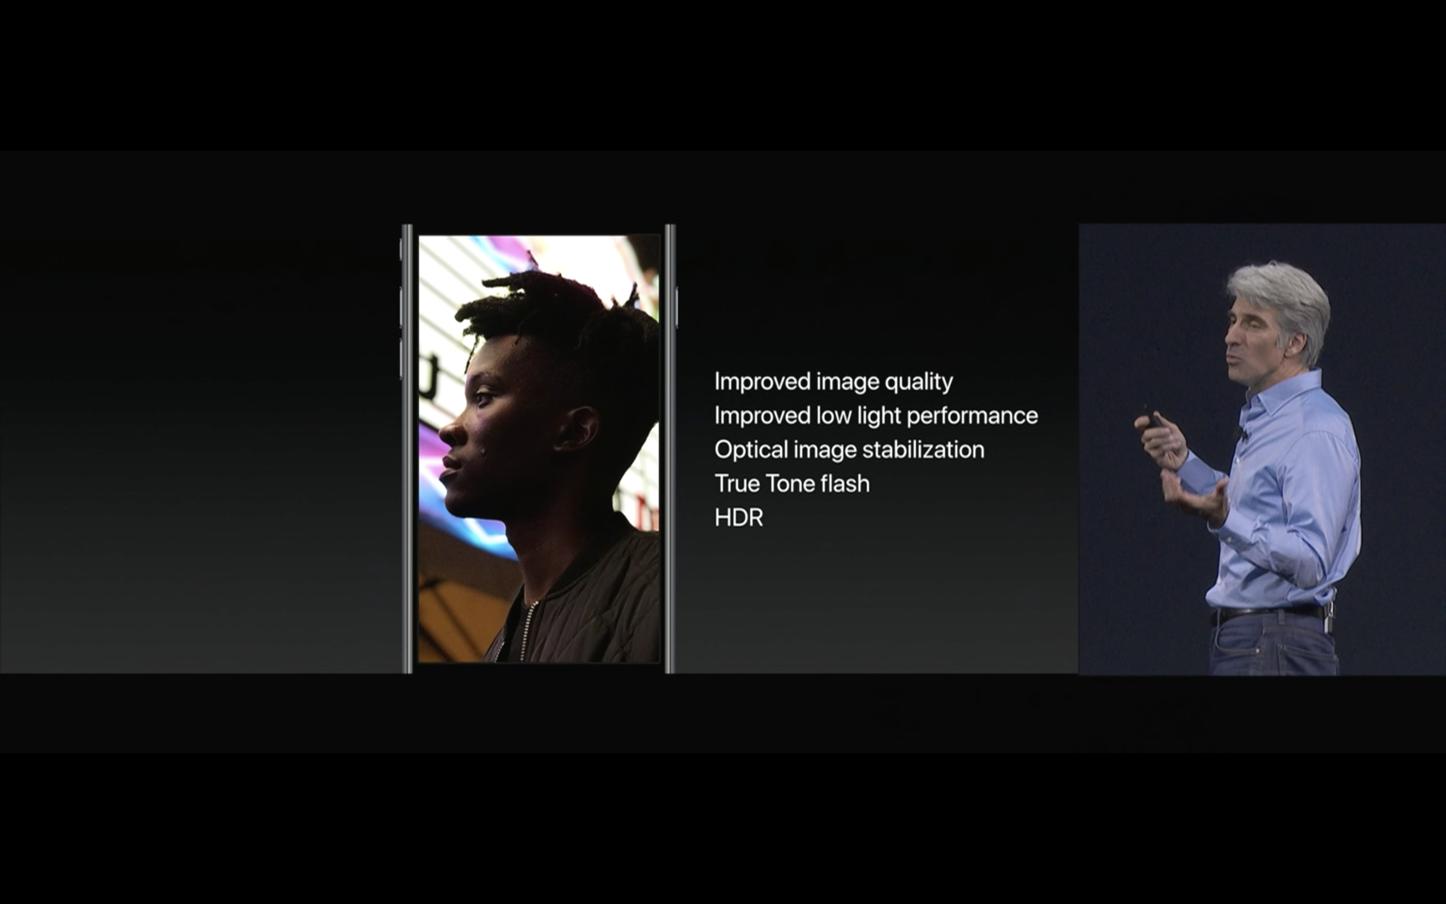 iOS11-2017-WWDC17-26.png